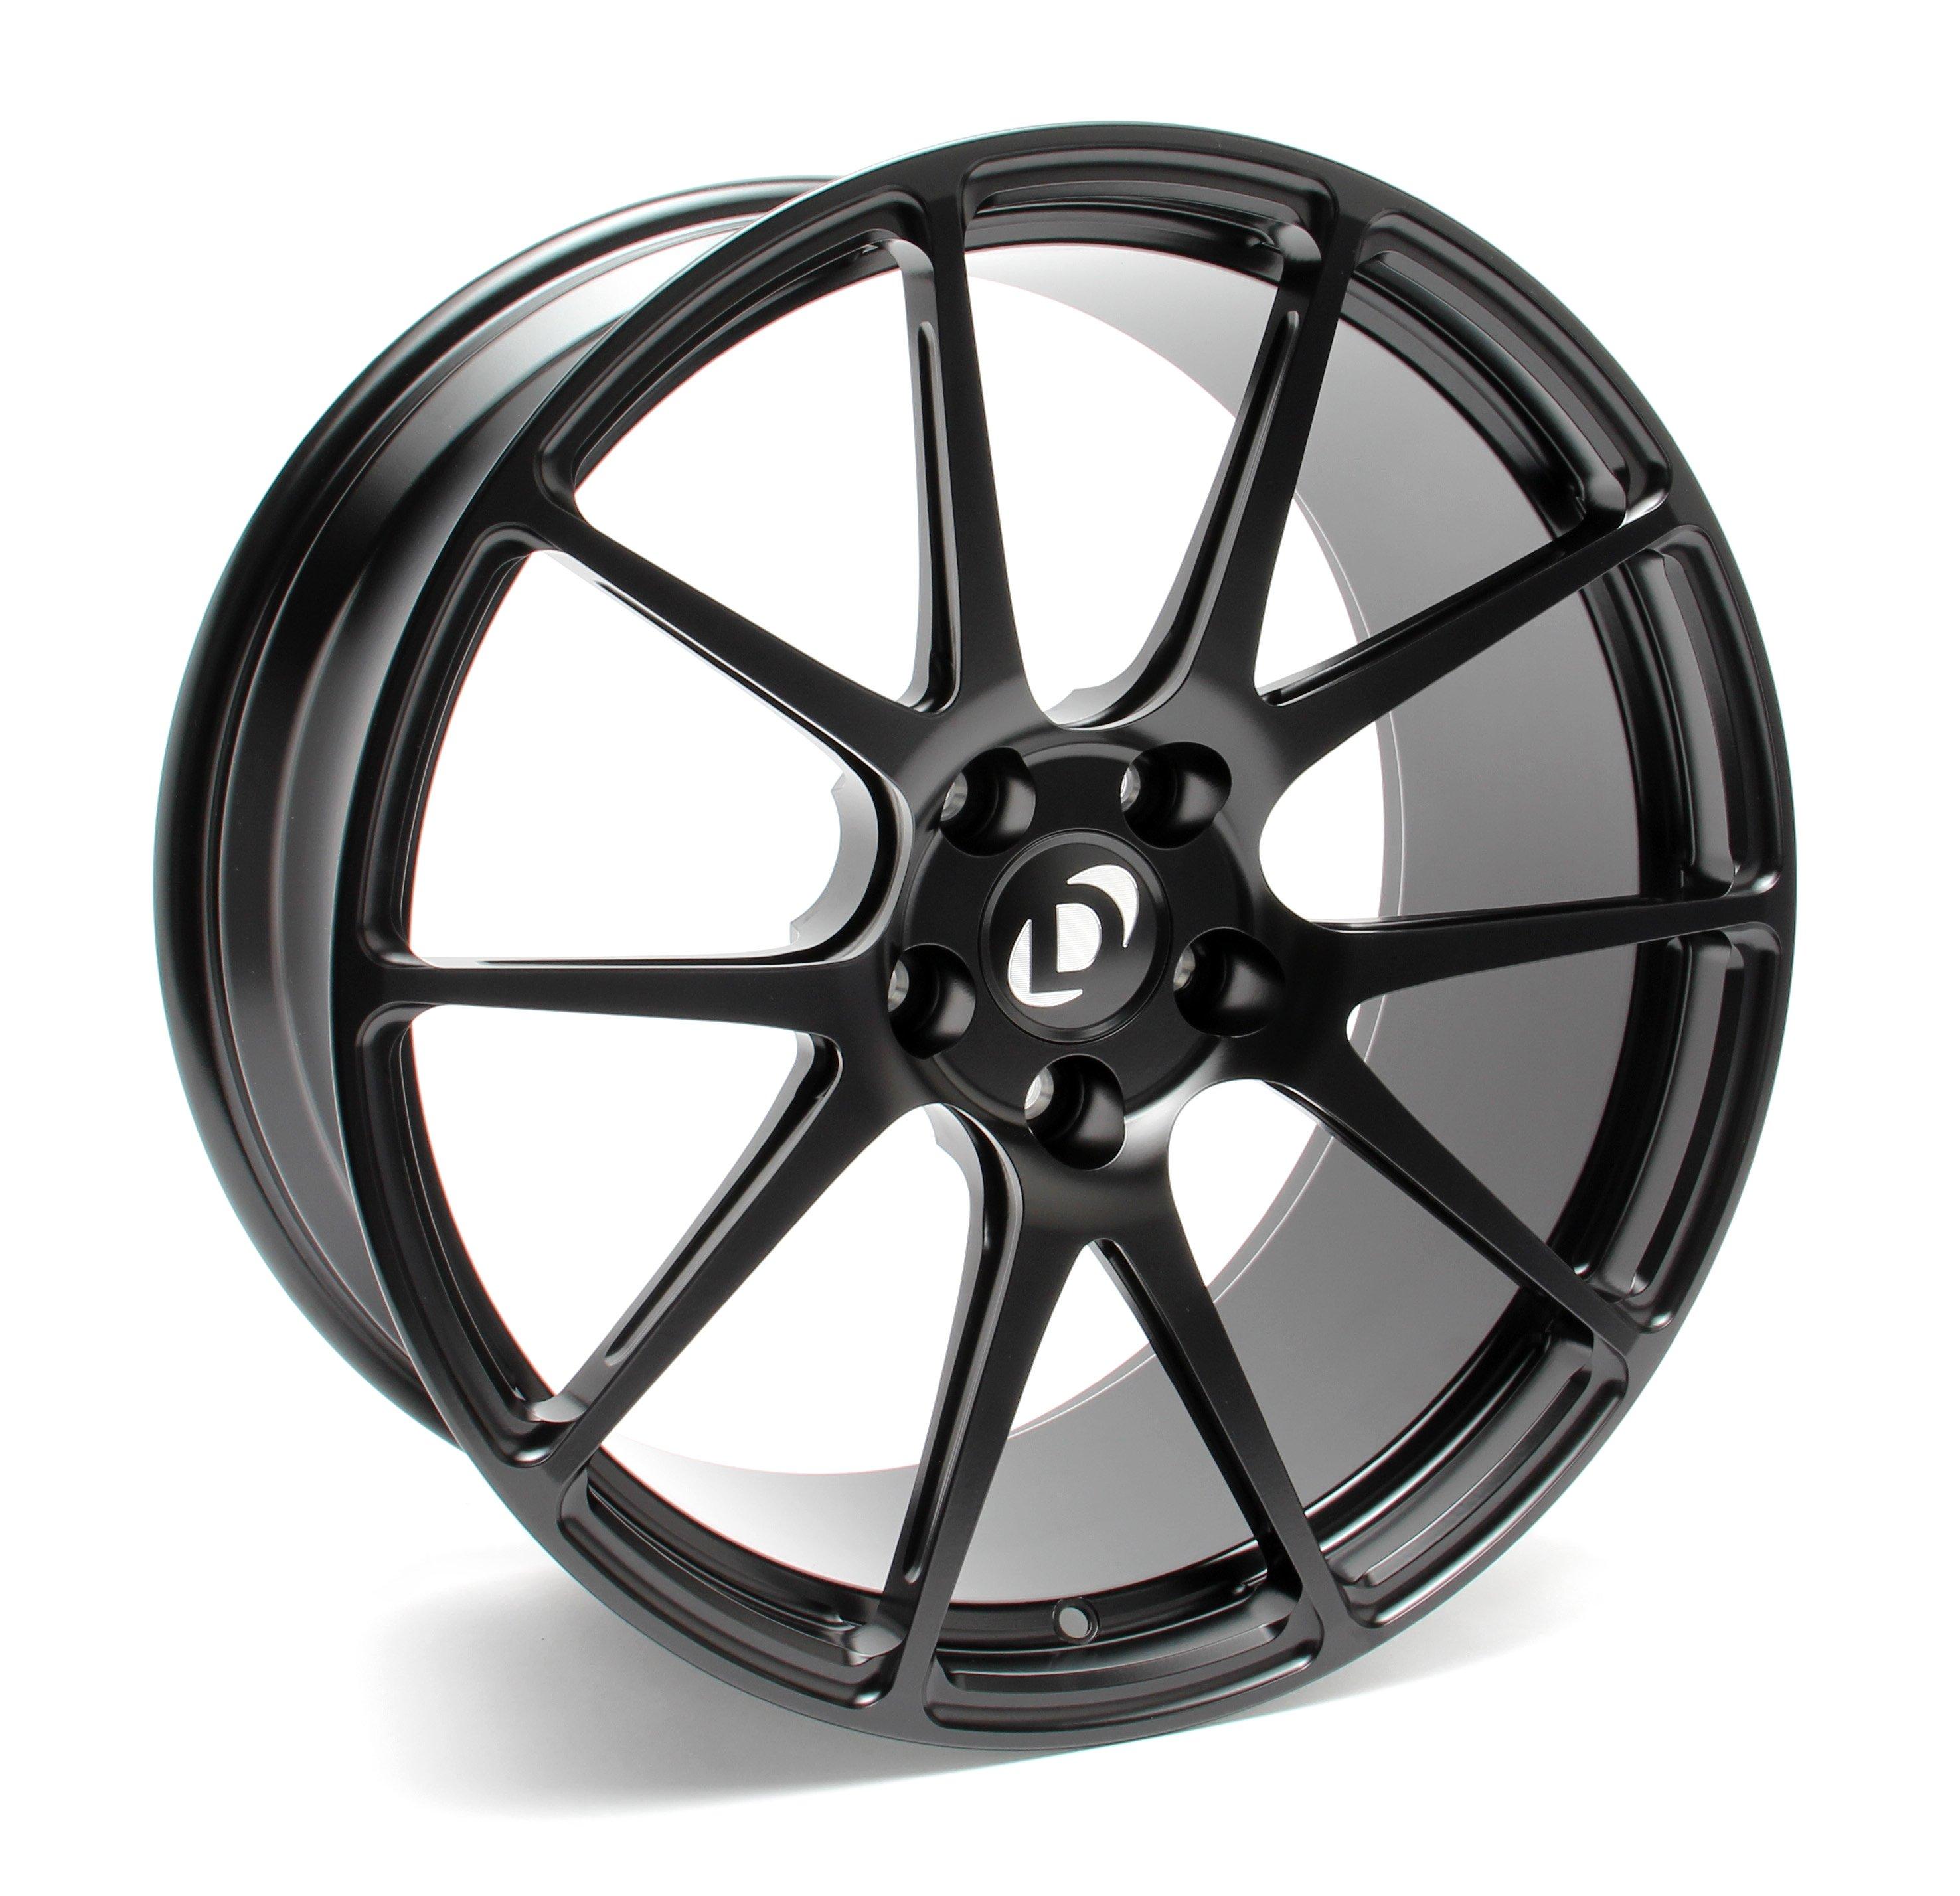 Dinan D750-0087-GA1R-BLK Forgeline GA1R Performance Wheel